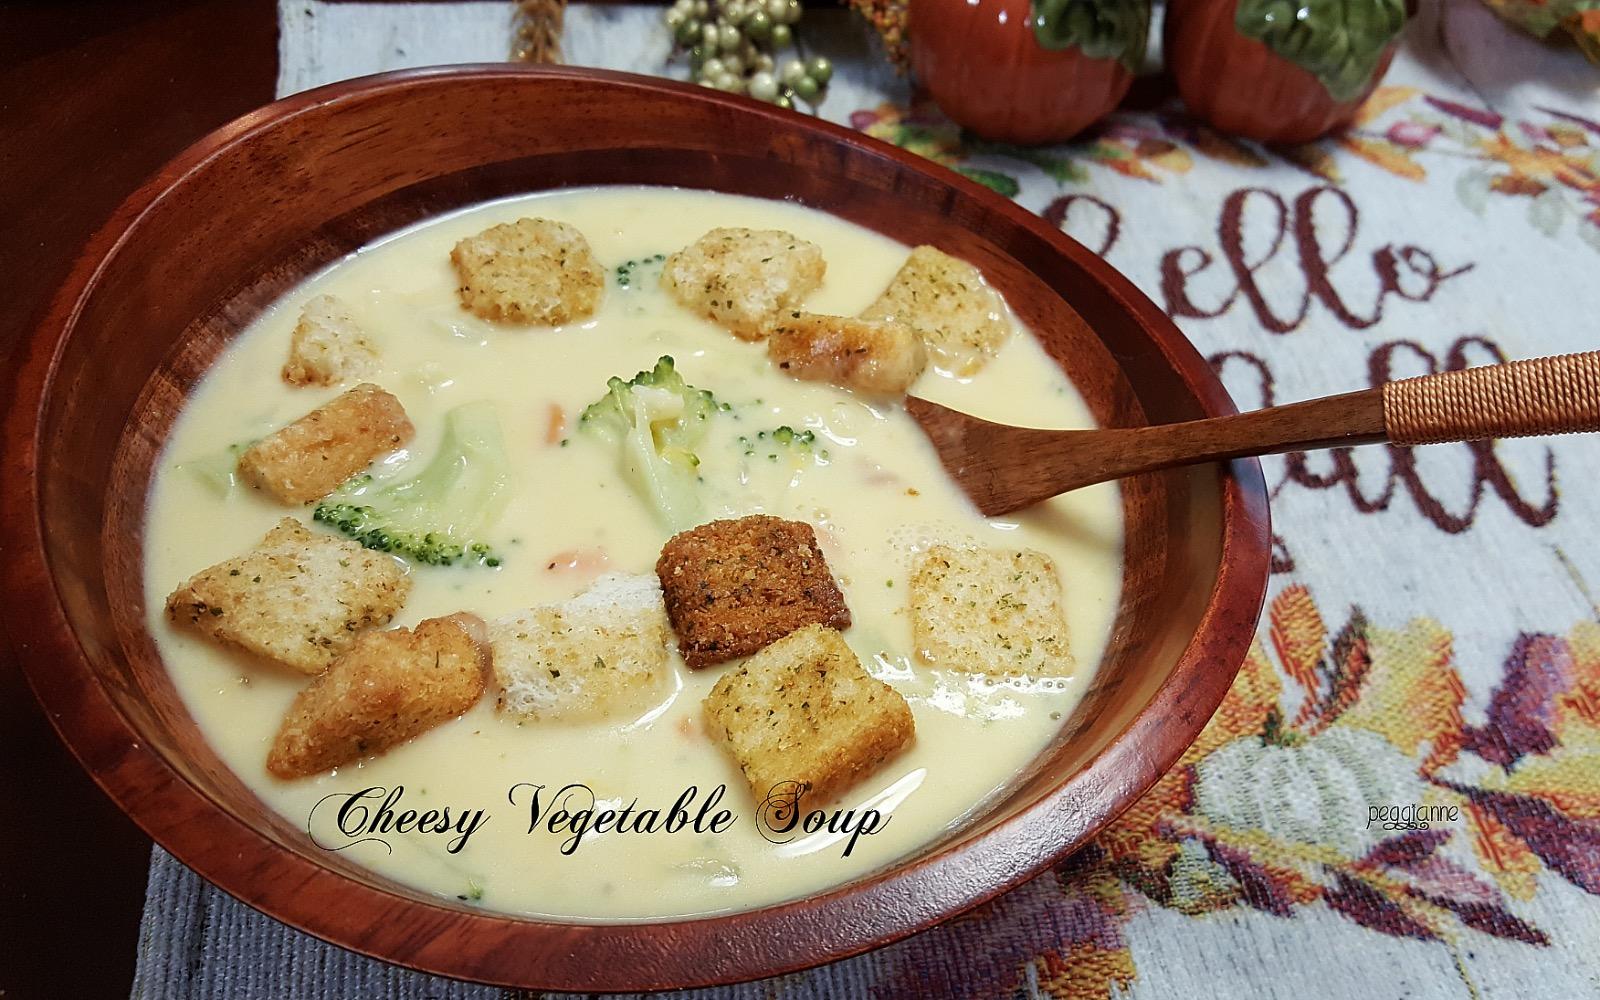 Cheesy Vegetable Soup I